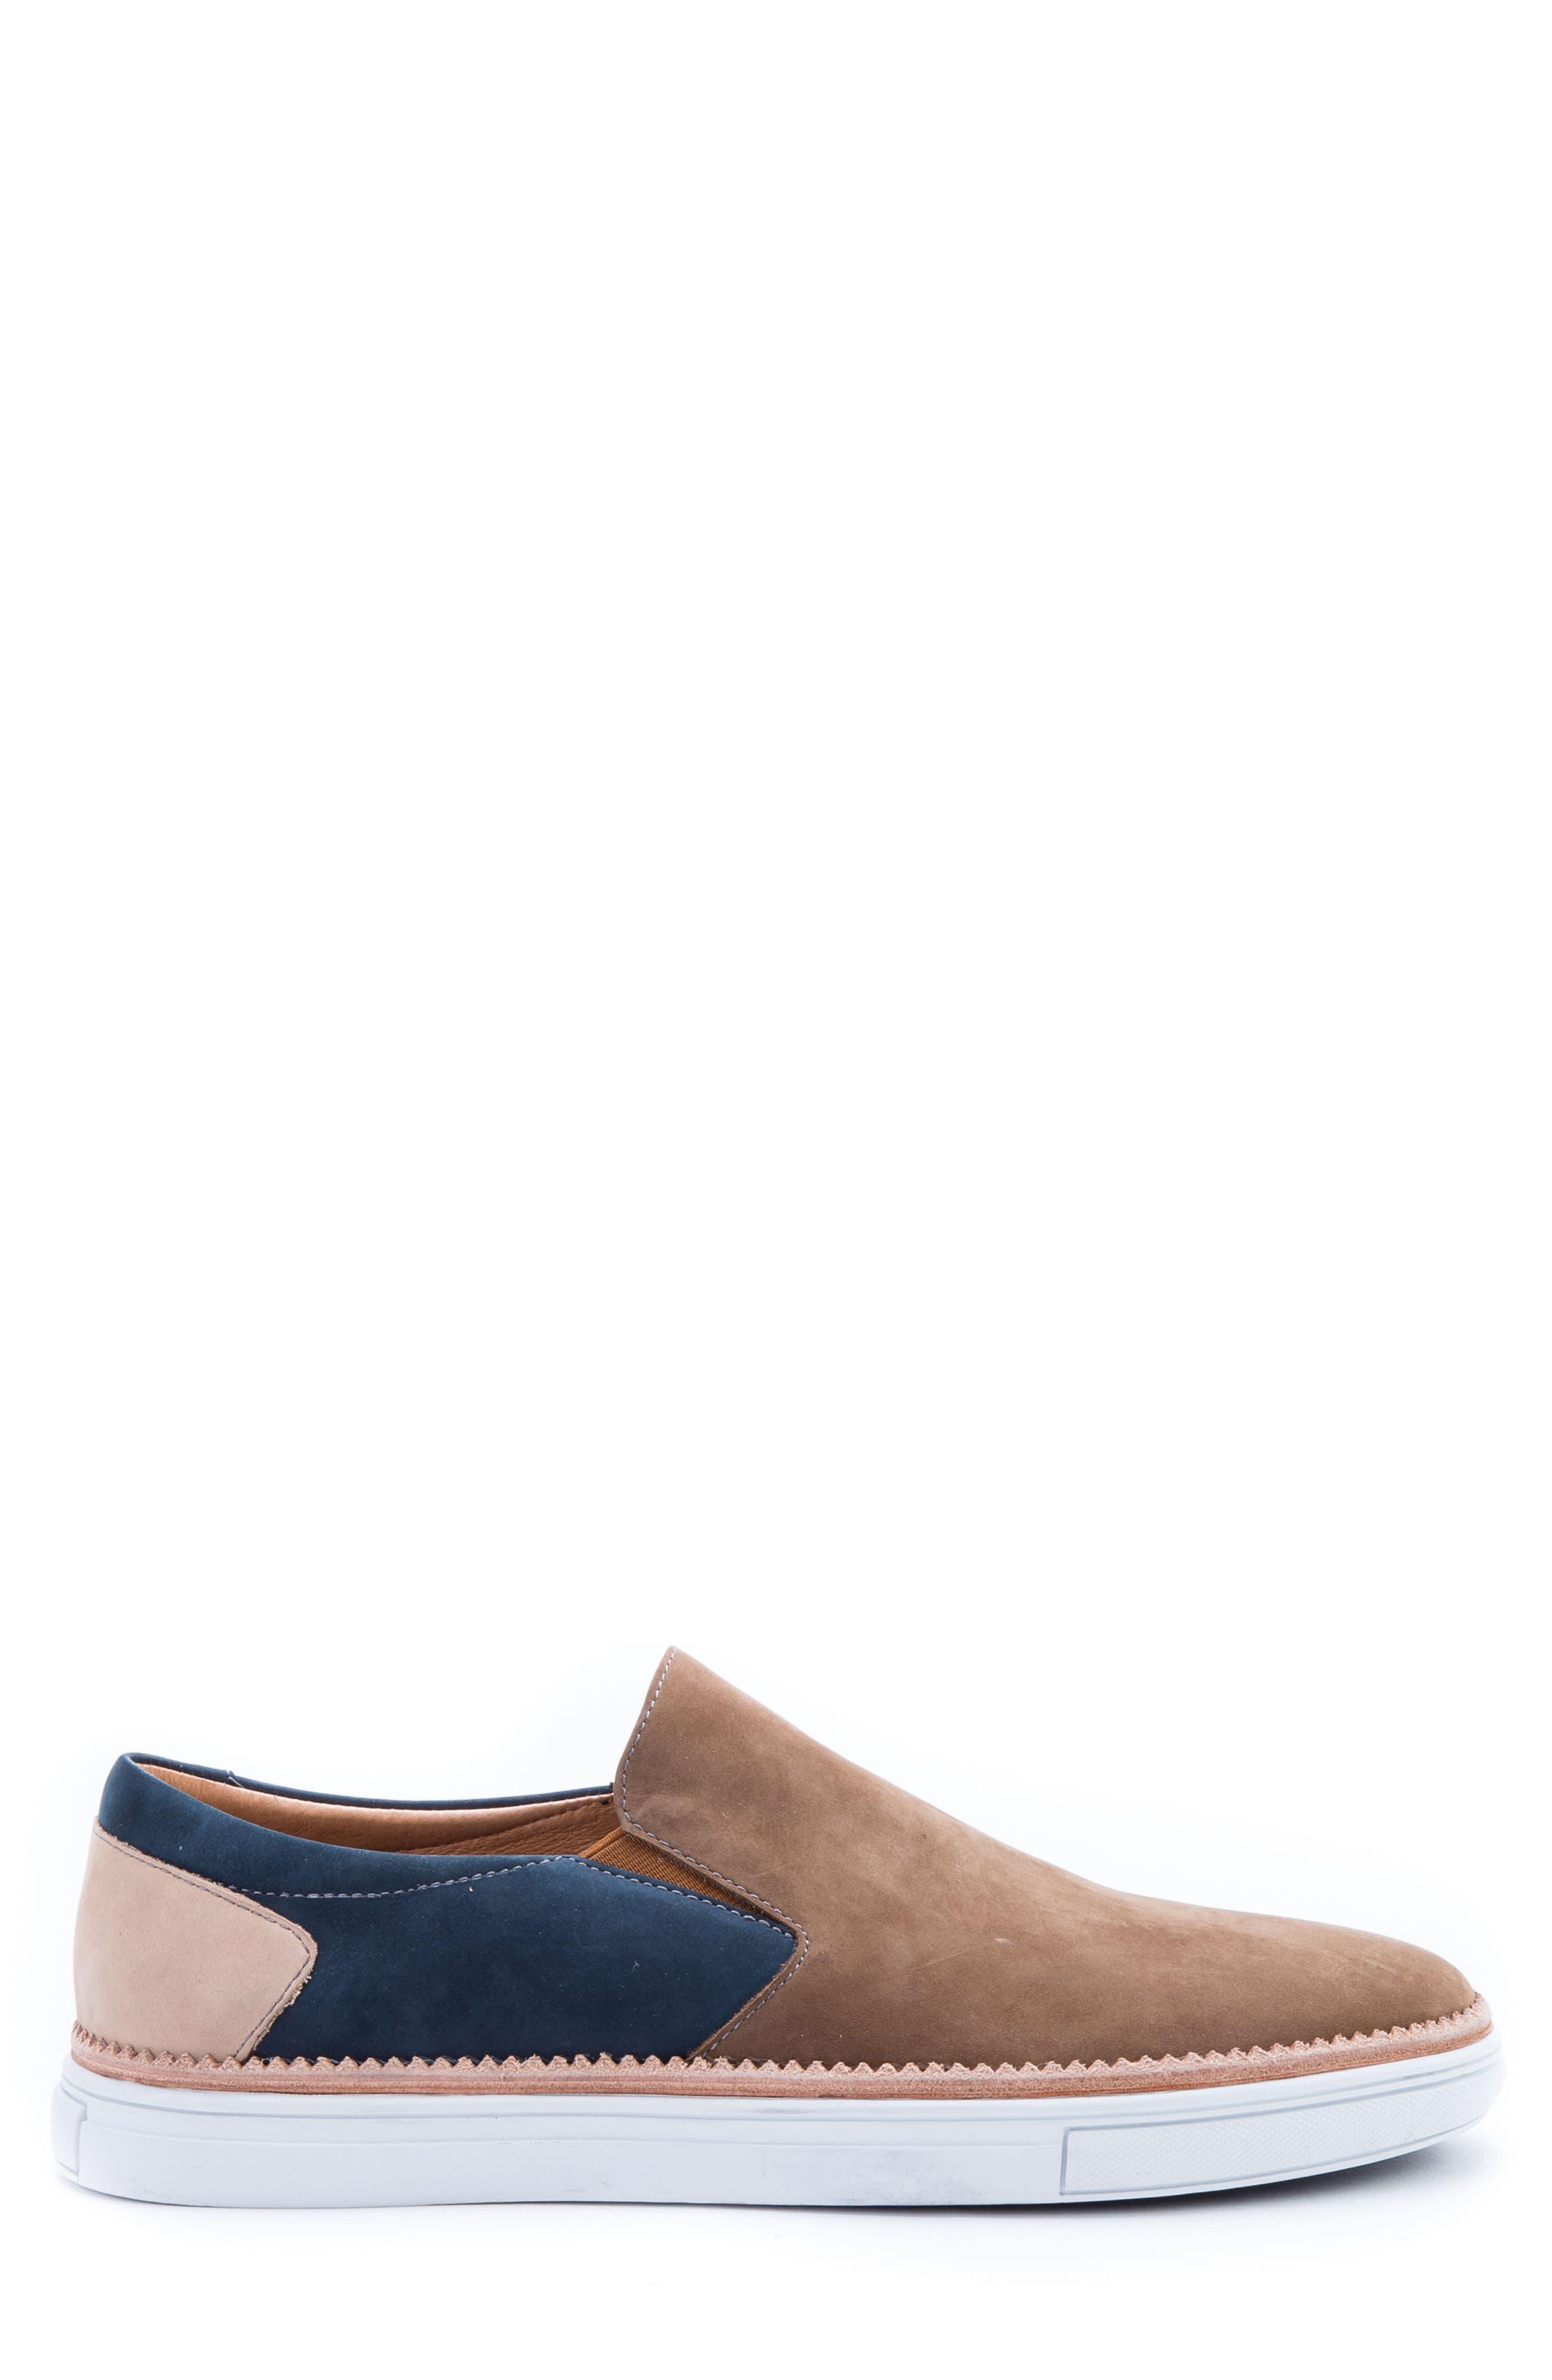 Rivera Colorblocked Slip-On Sneaker,                             Alternate thumbnail 3, color,                             COGNAC SUEDE